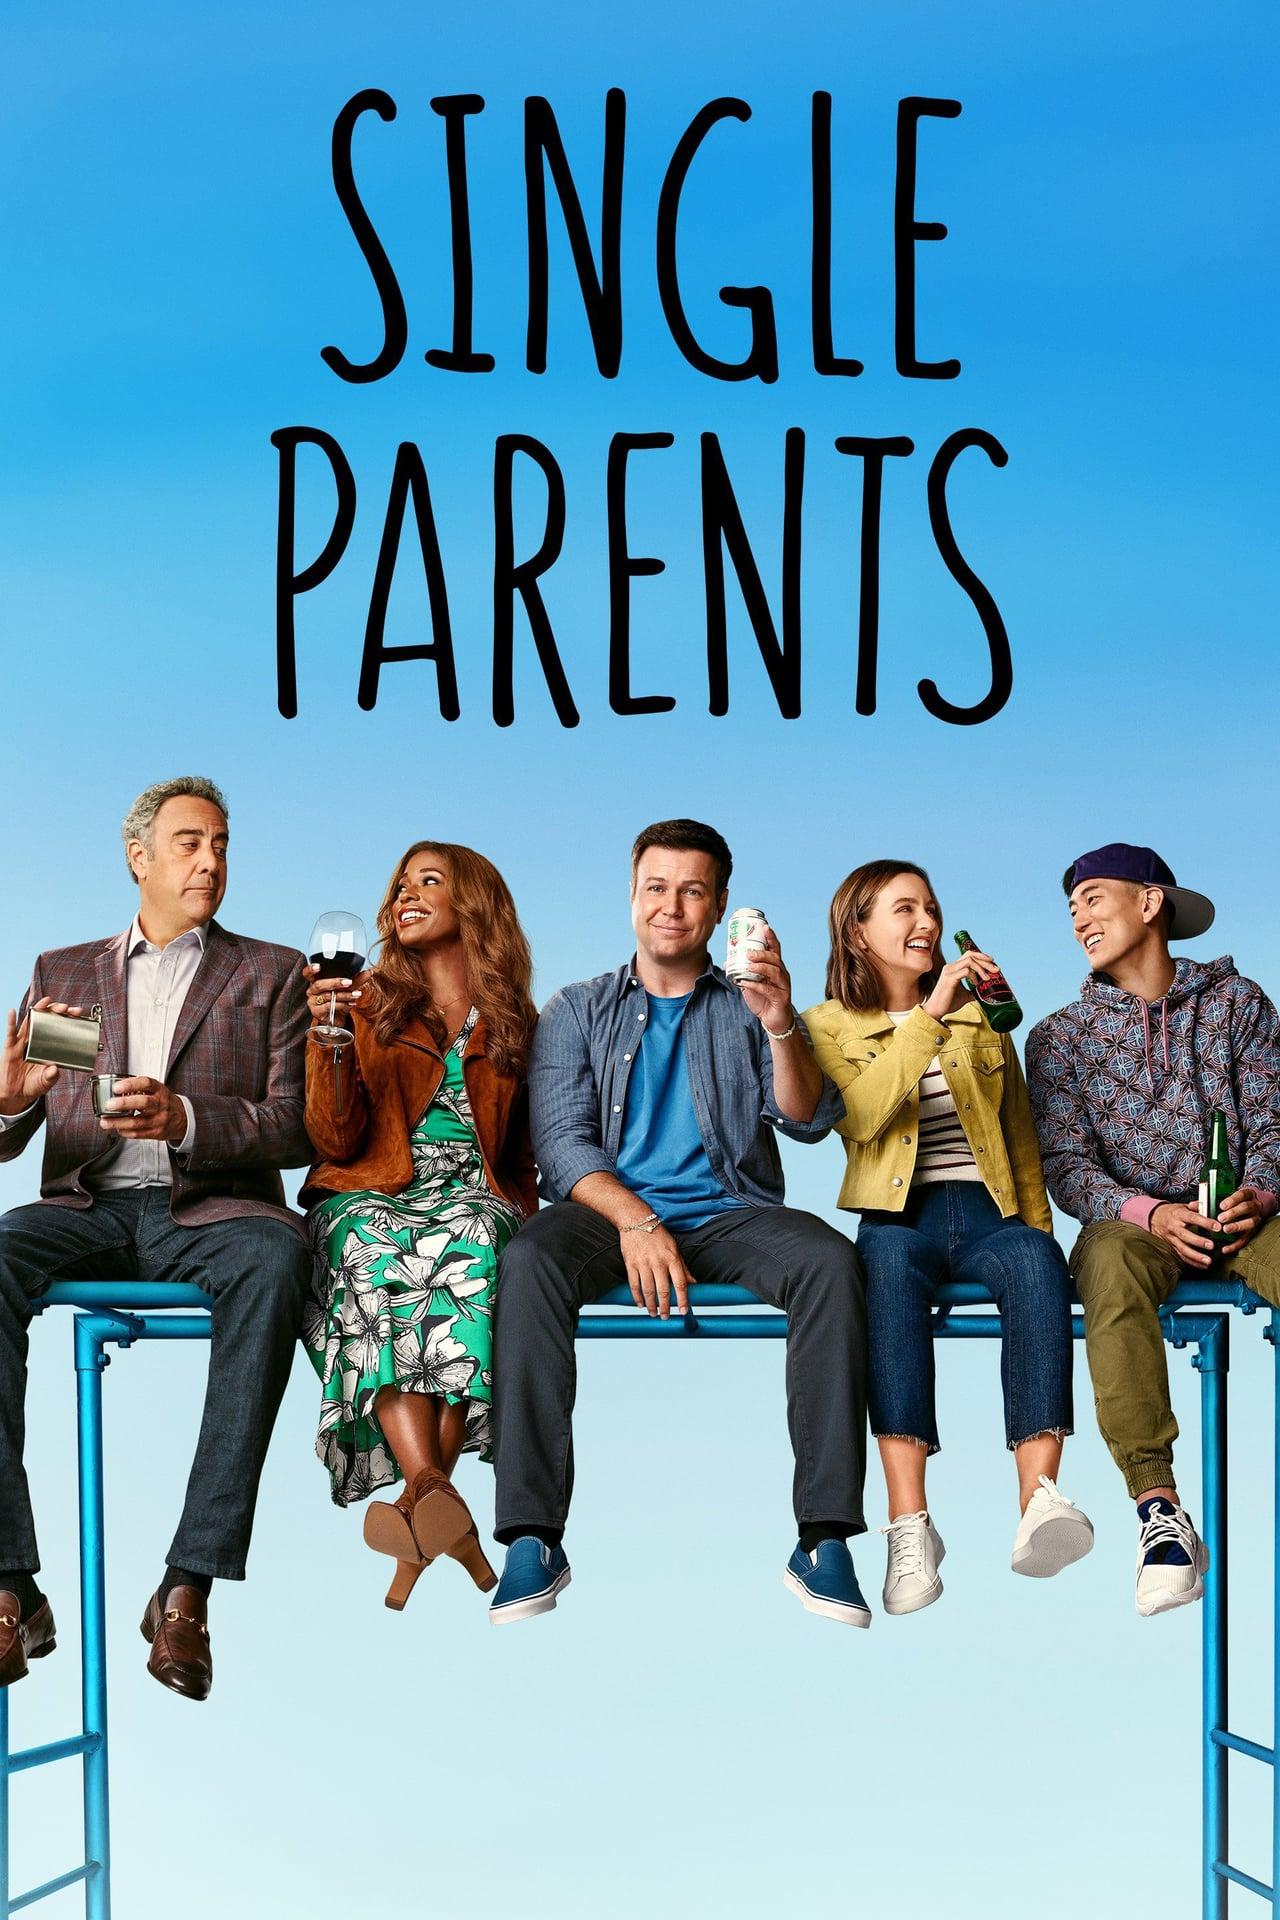 Single.Parents.S02E03.Derek.Sucks.iNTERNAL.720p.WEB.h264-BAMBOOZLE